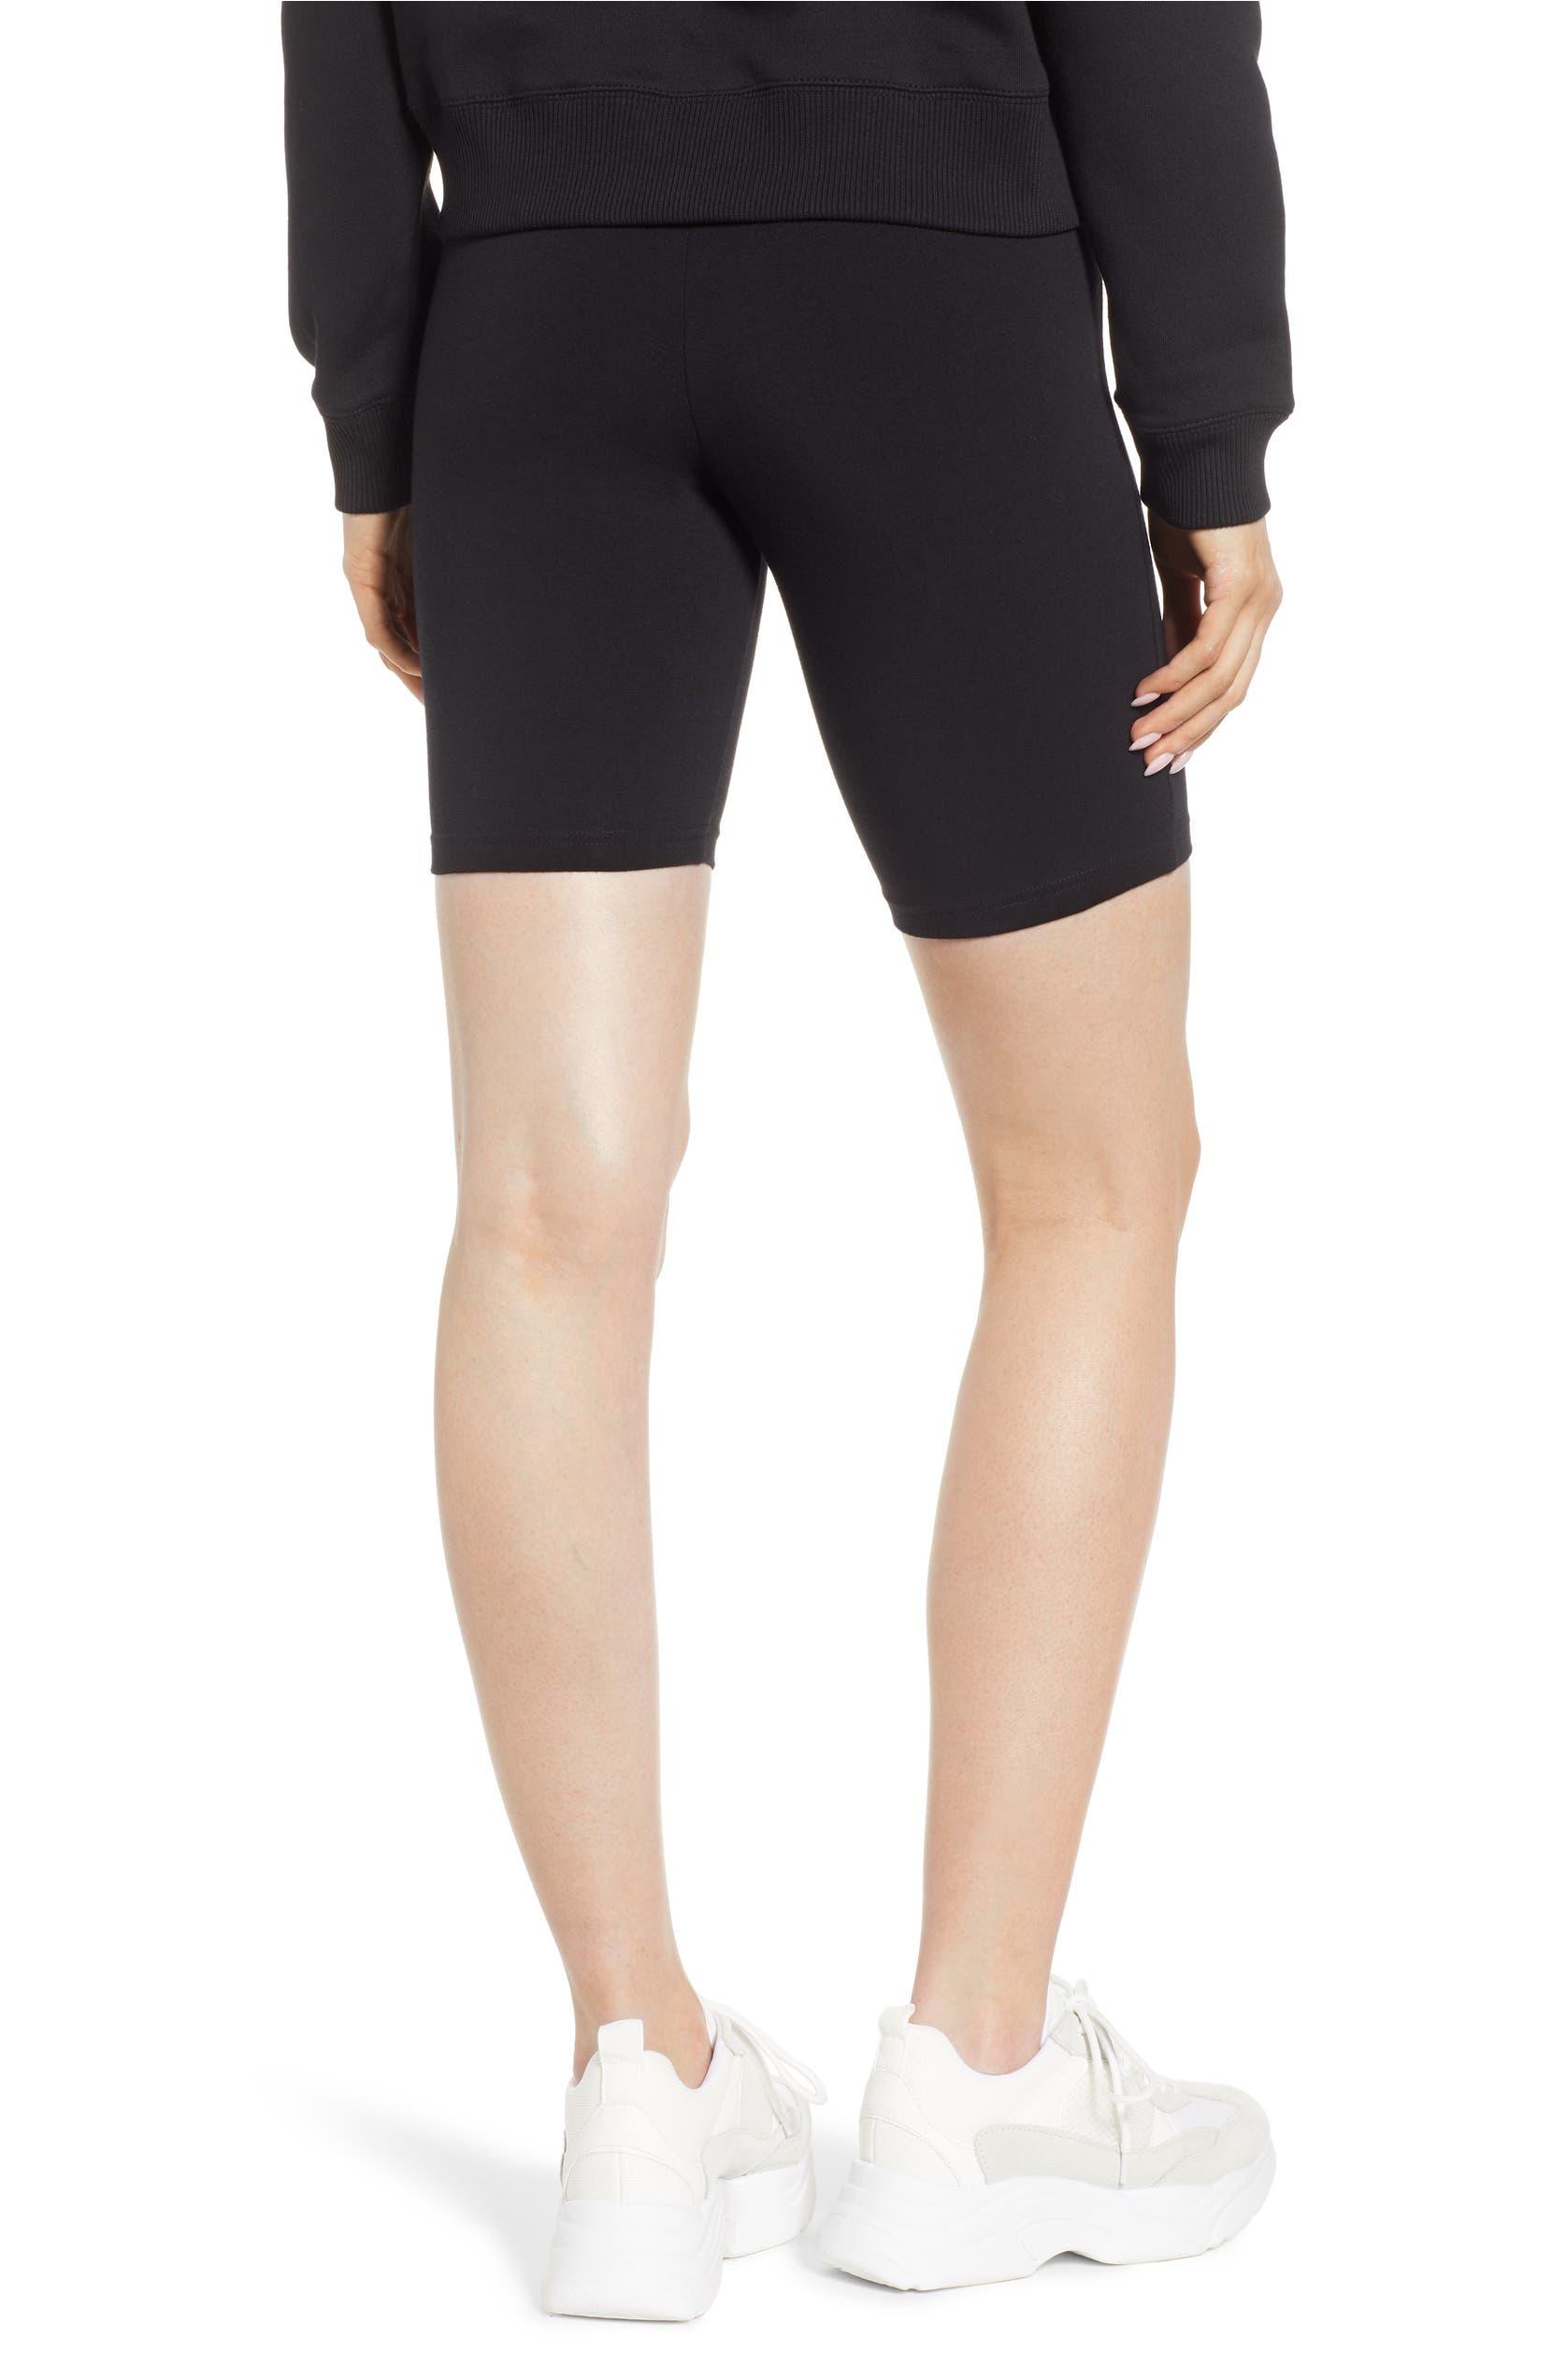 0fcb430c02 Hue High Waist Cotton Blend Bike Shorts | Nordstrom